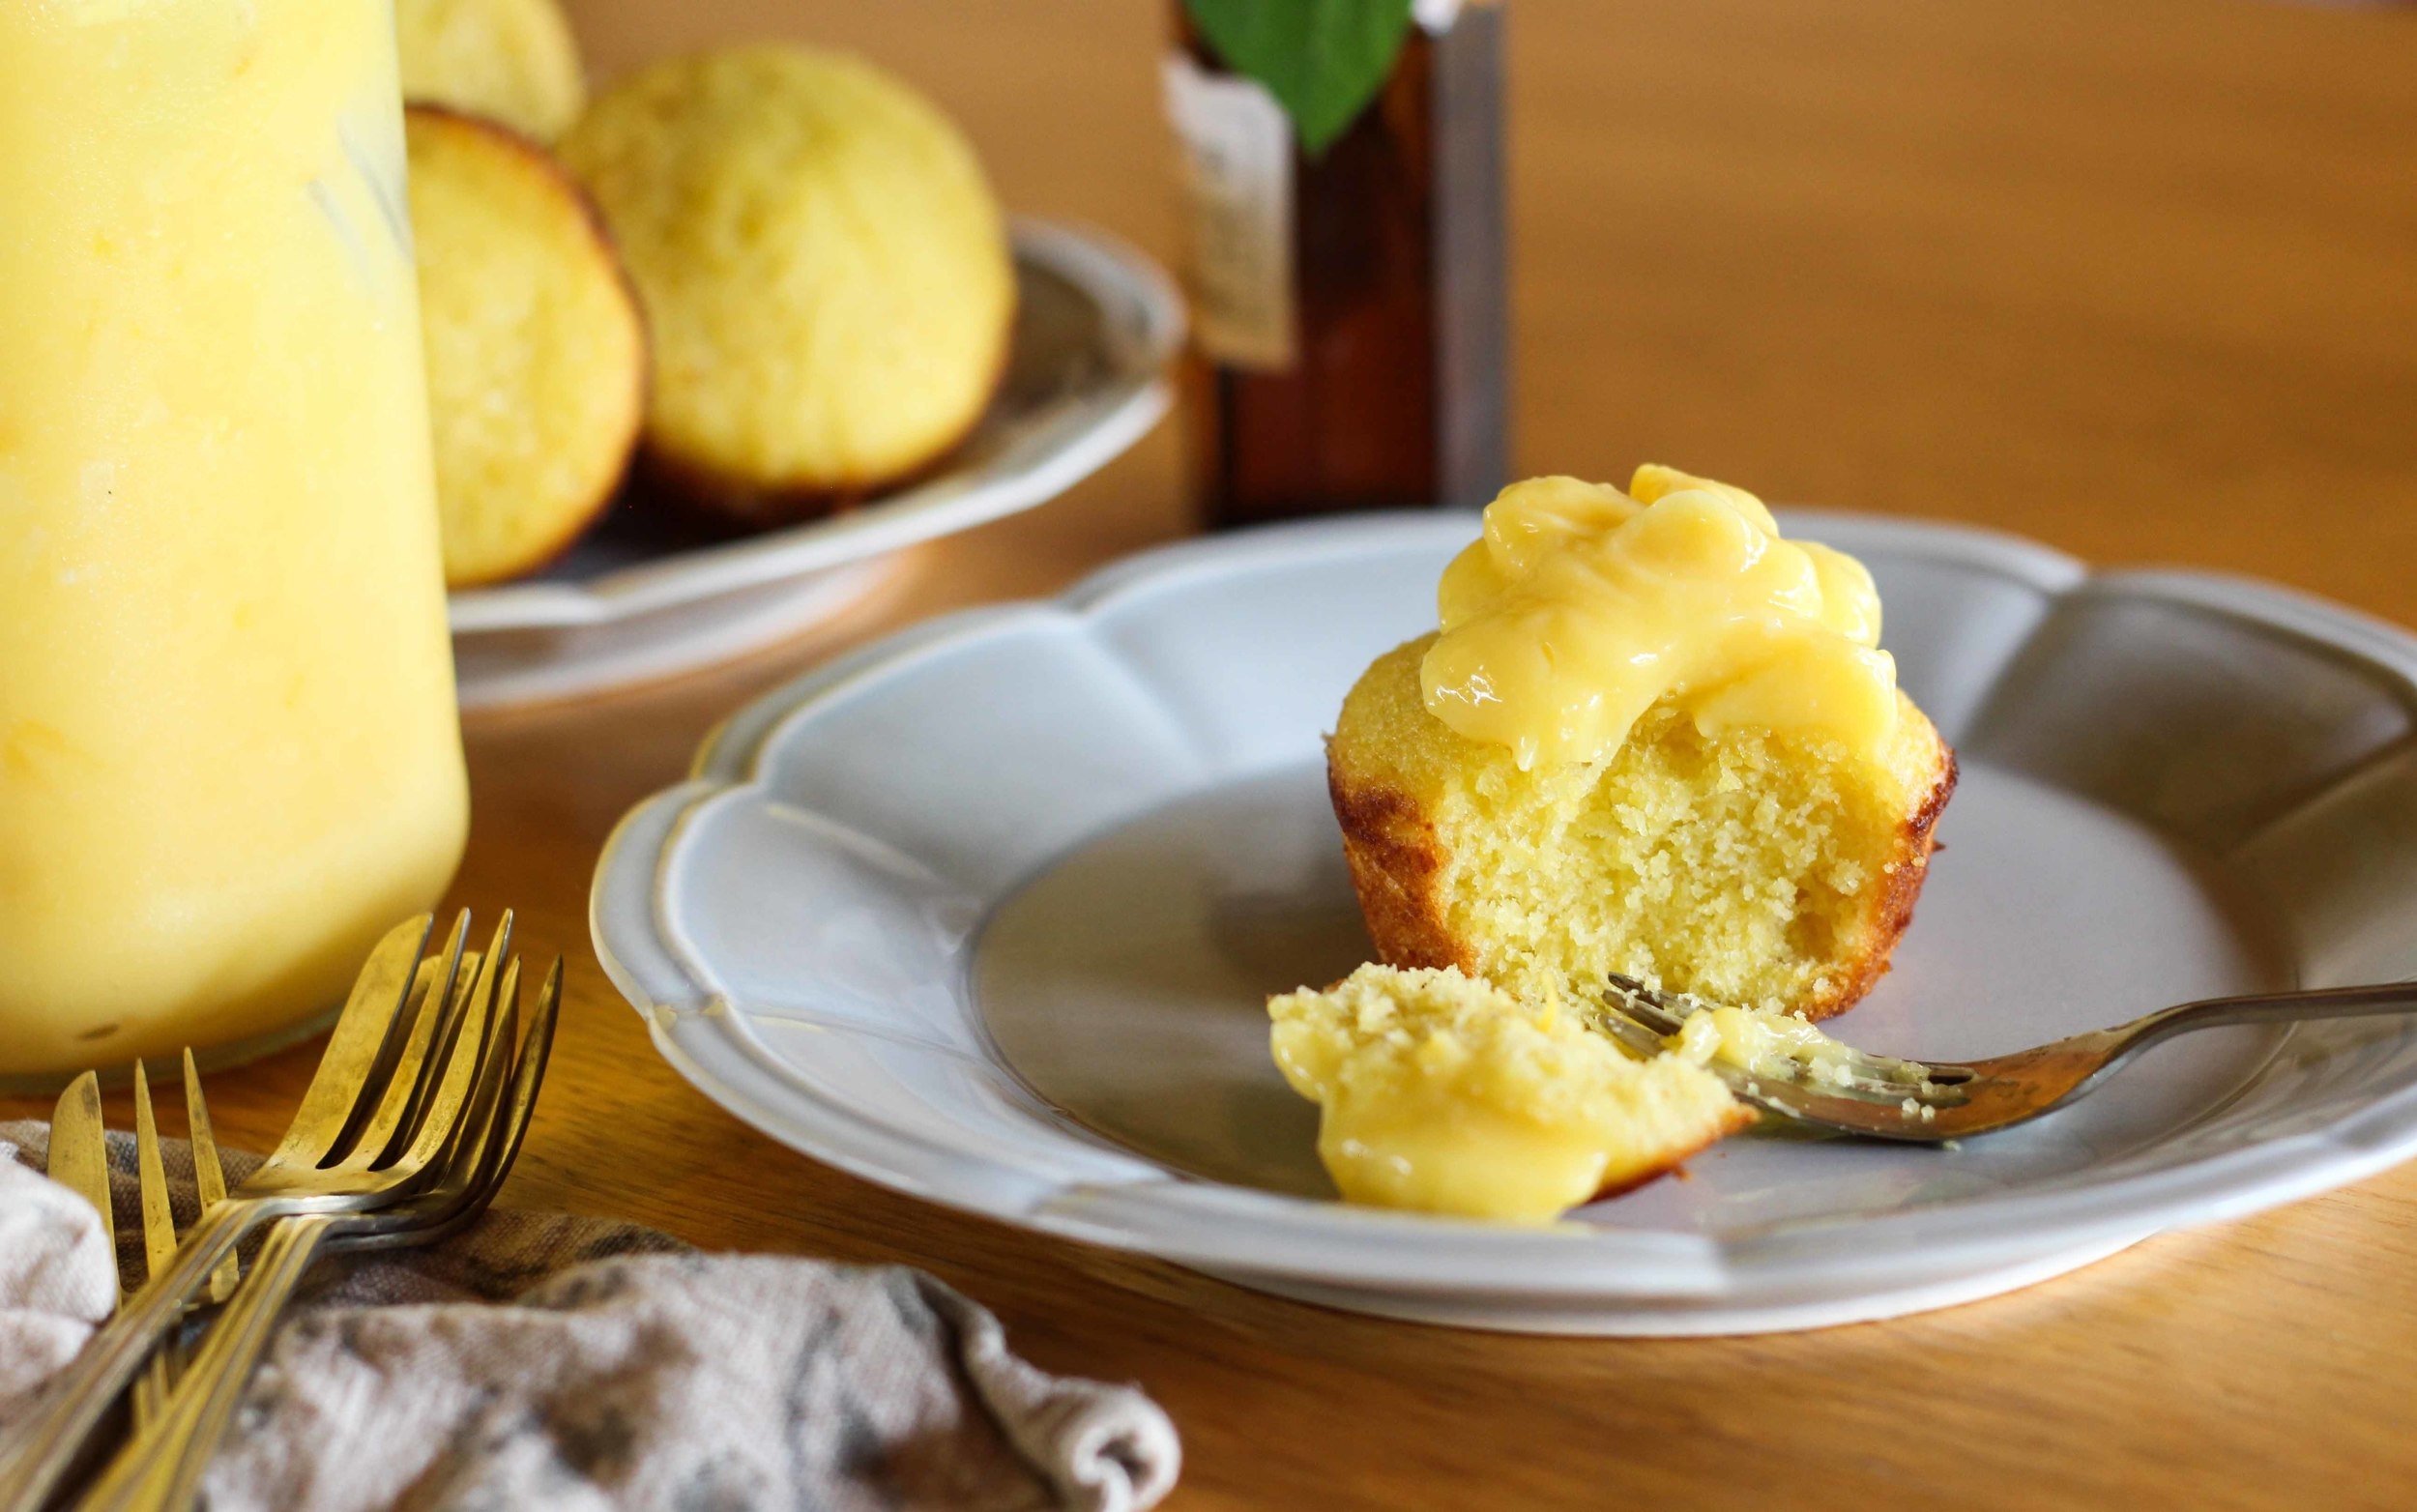 Little Lemon Polenta Cakes with Lemon Curd